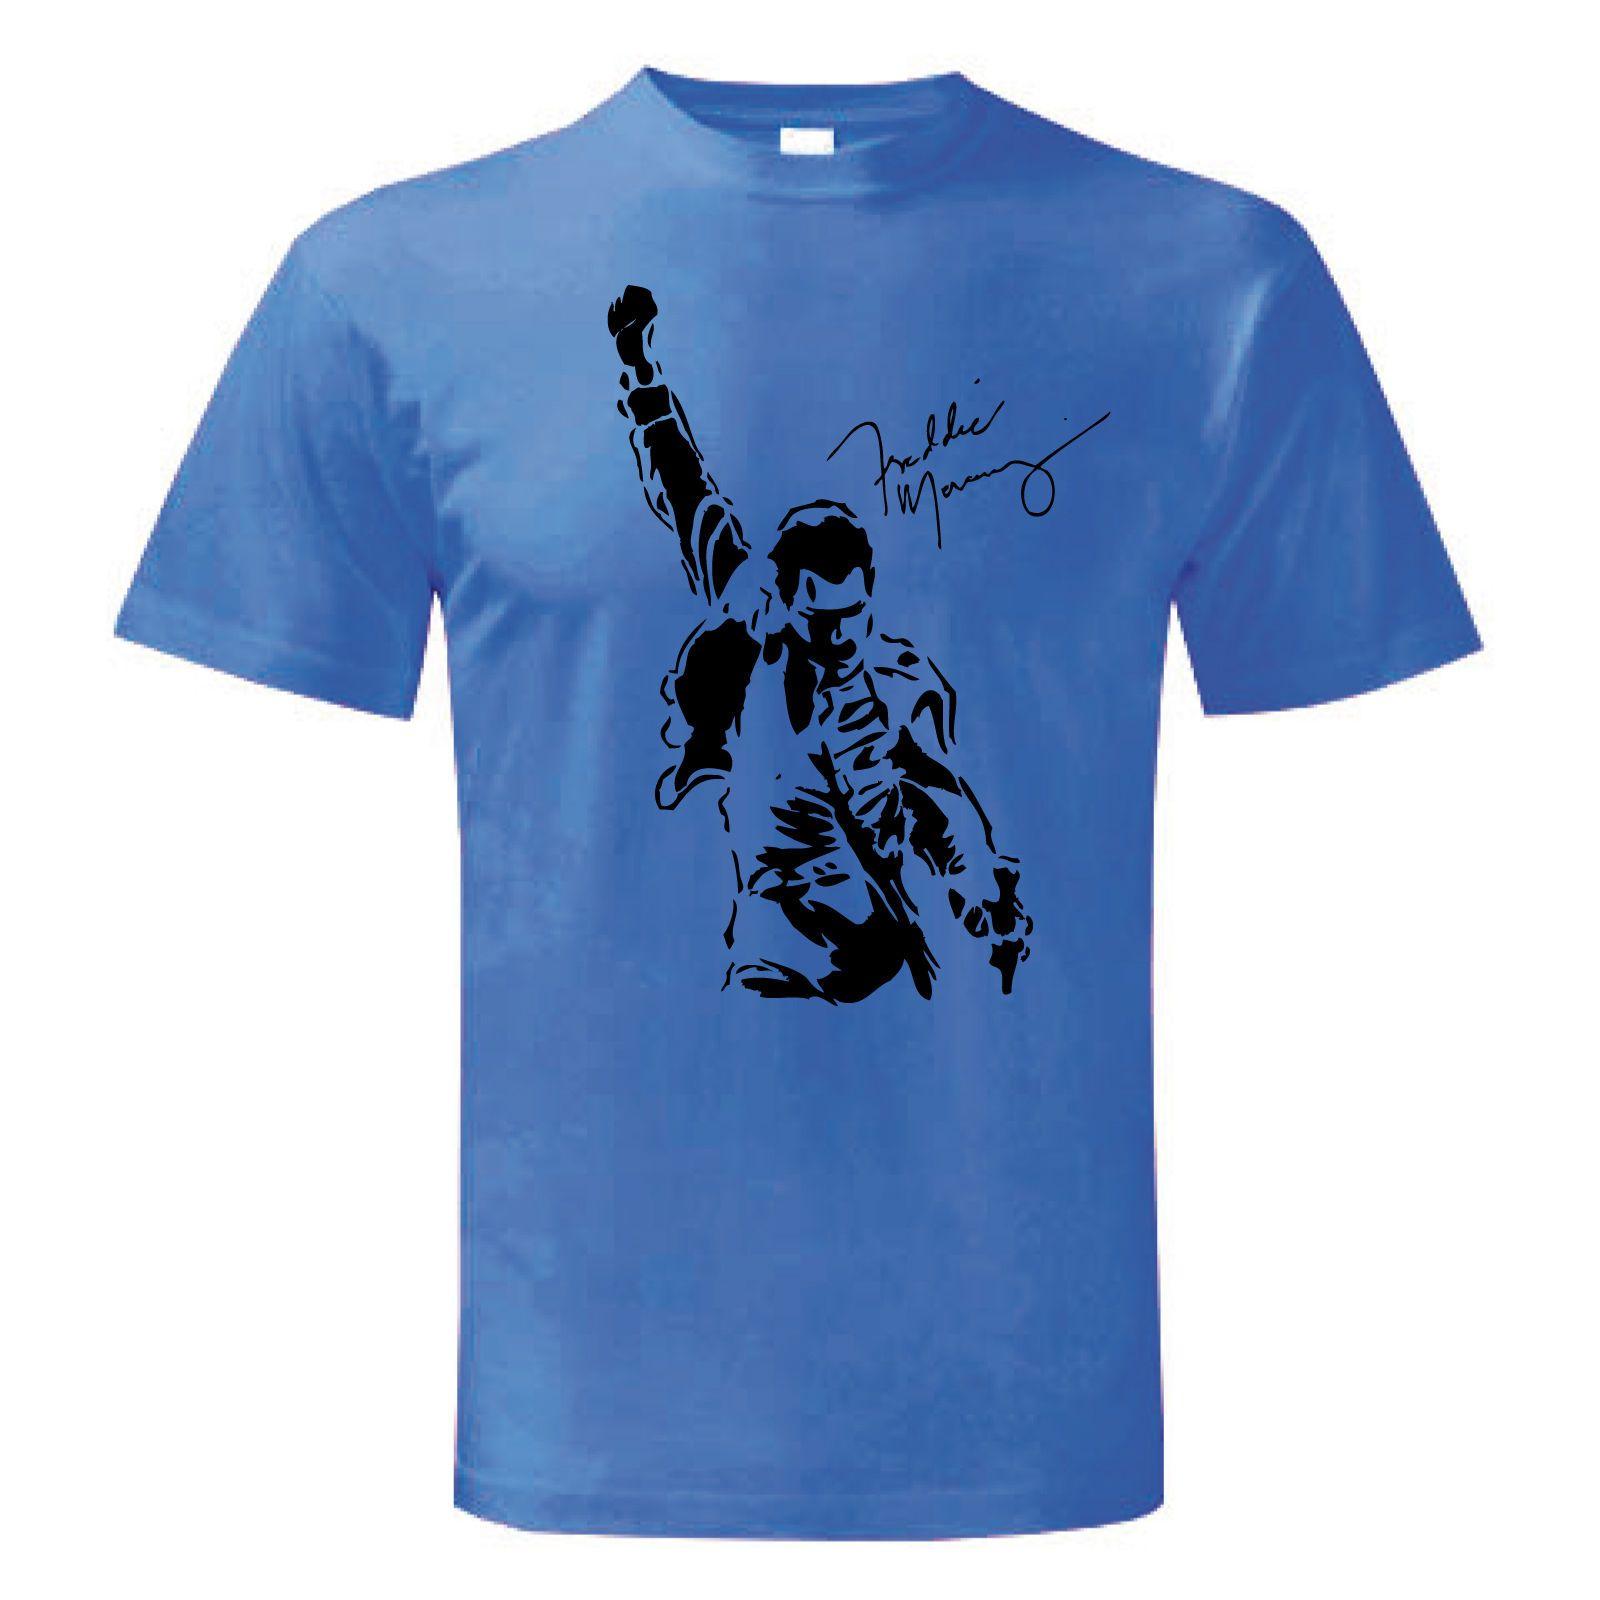 722d238d44f T Shirt FREDDIE MERCURY Freddy Maglietta Maglia Uomo Donna Man Queen  INNUENDO Day Shirt Tee T From Beidhgate06